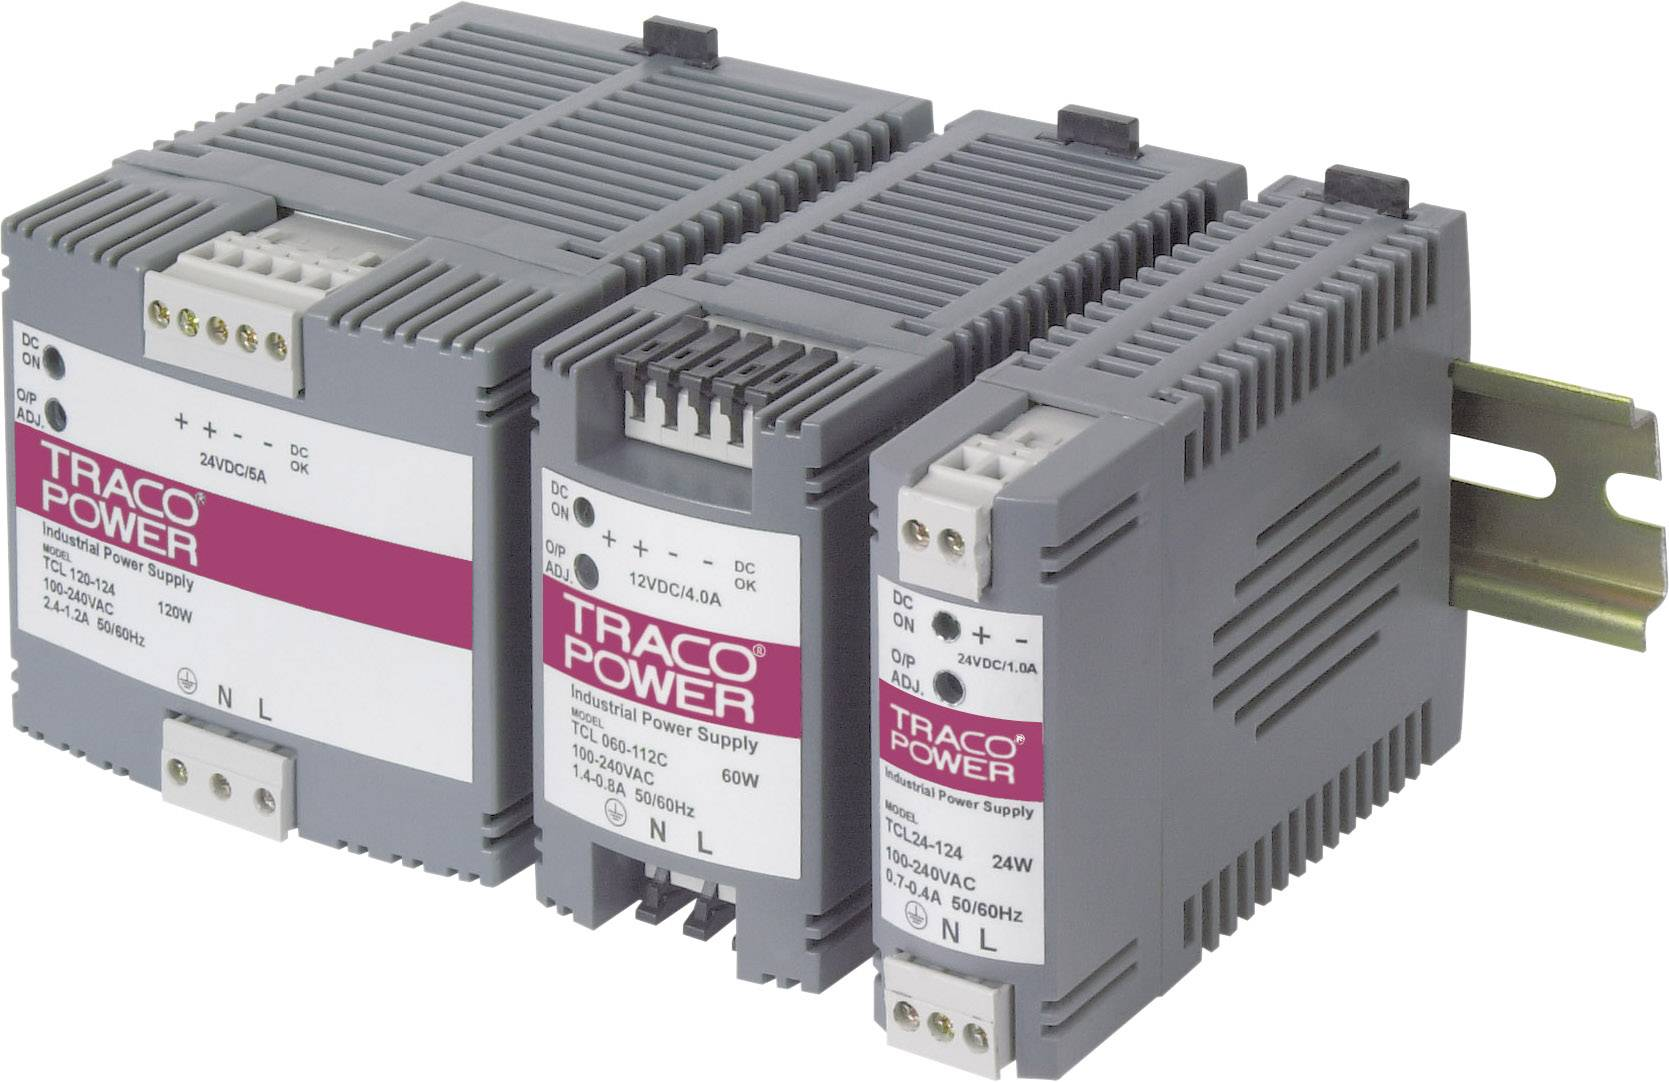 Zdroj na DIN lištu TracoPower TCL 060-112, 12 V/DC, 4 A